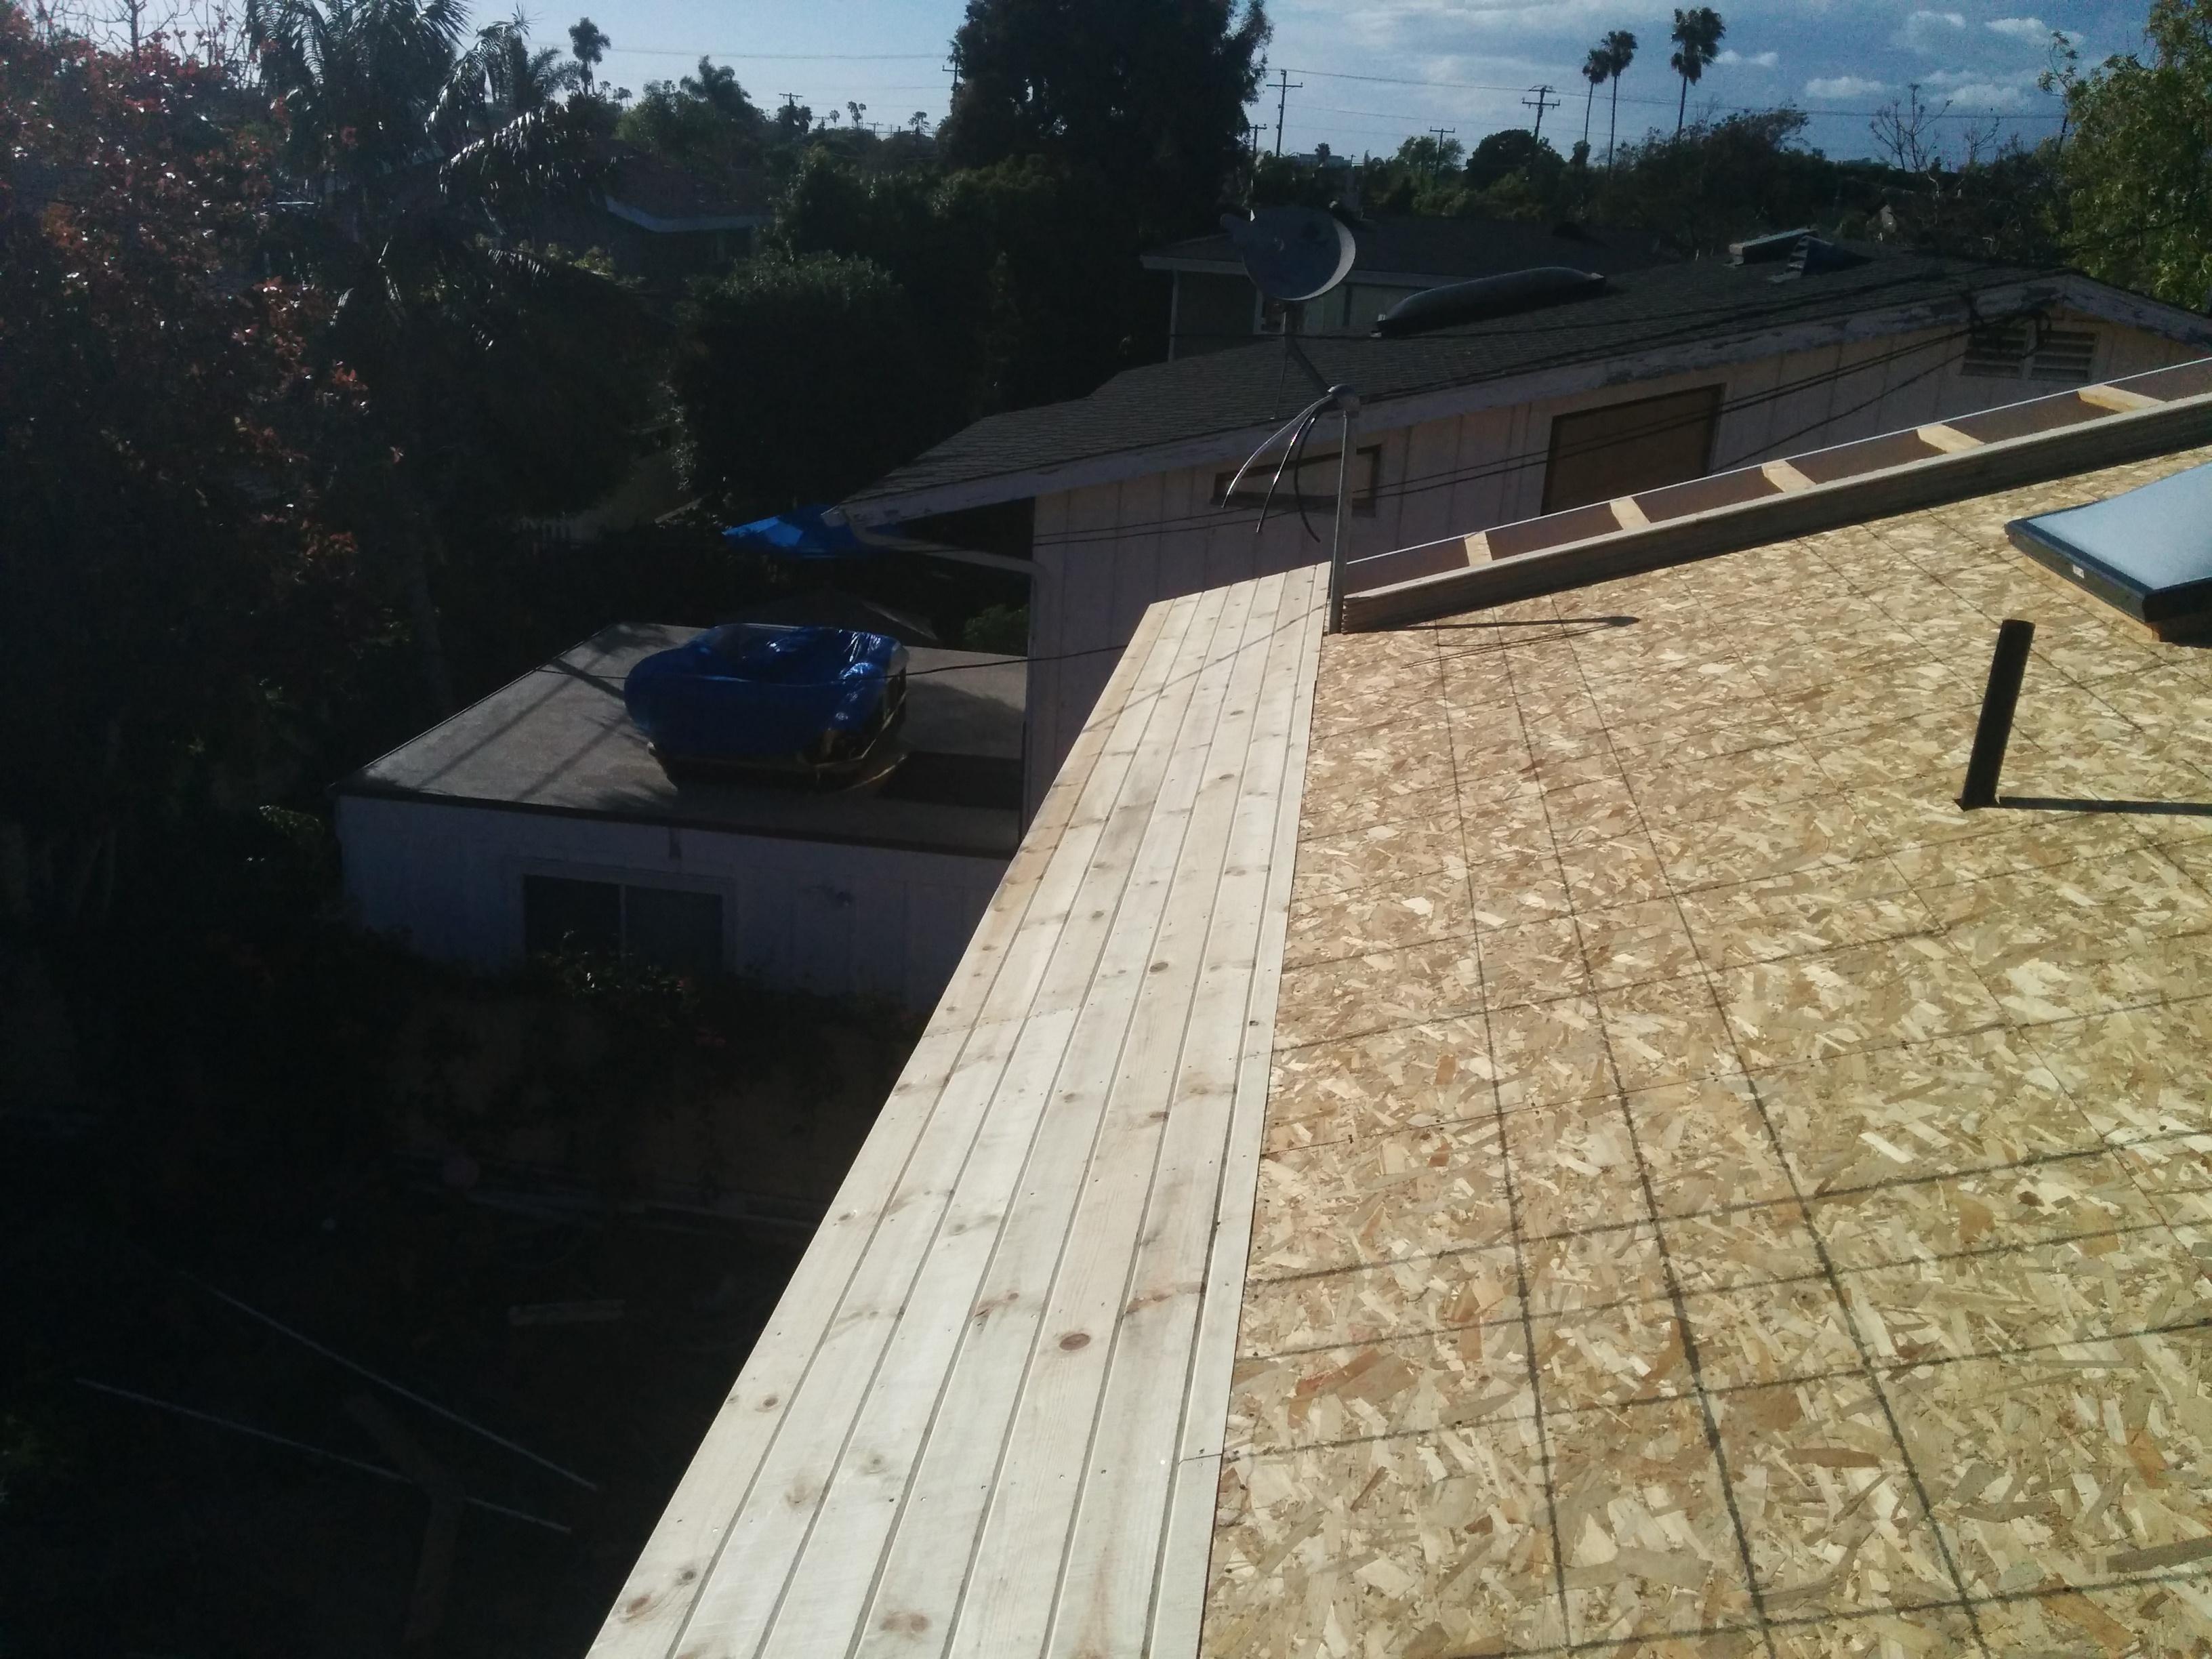 Plotz Amp Tanner Construction Company Windsorone